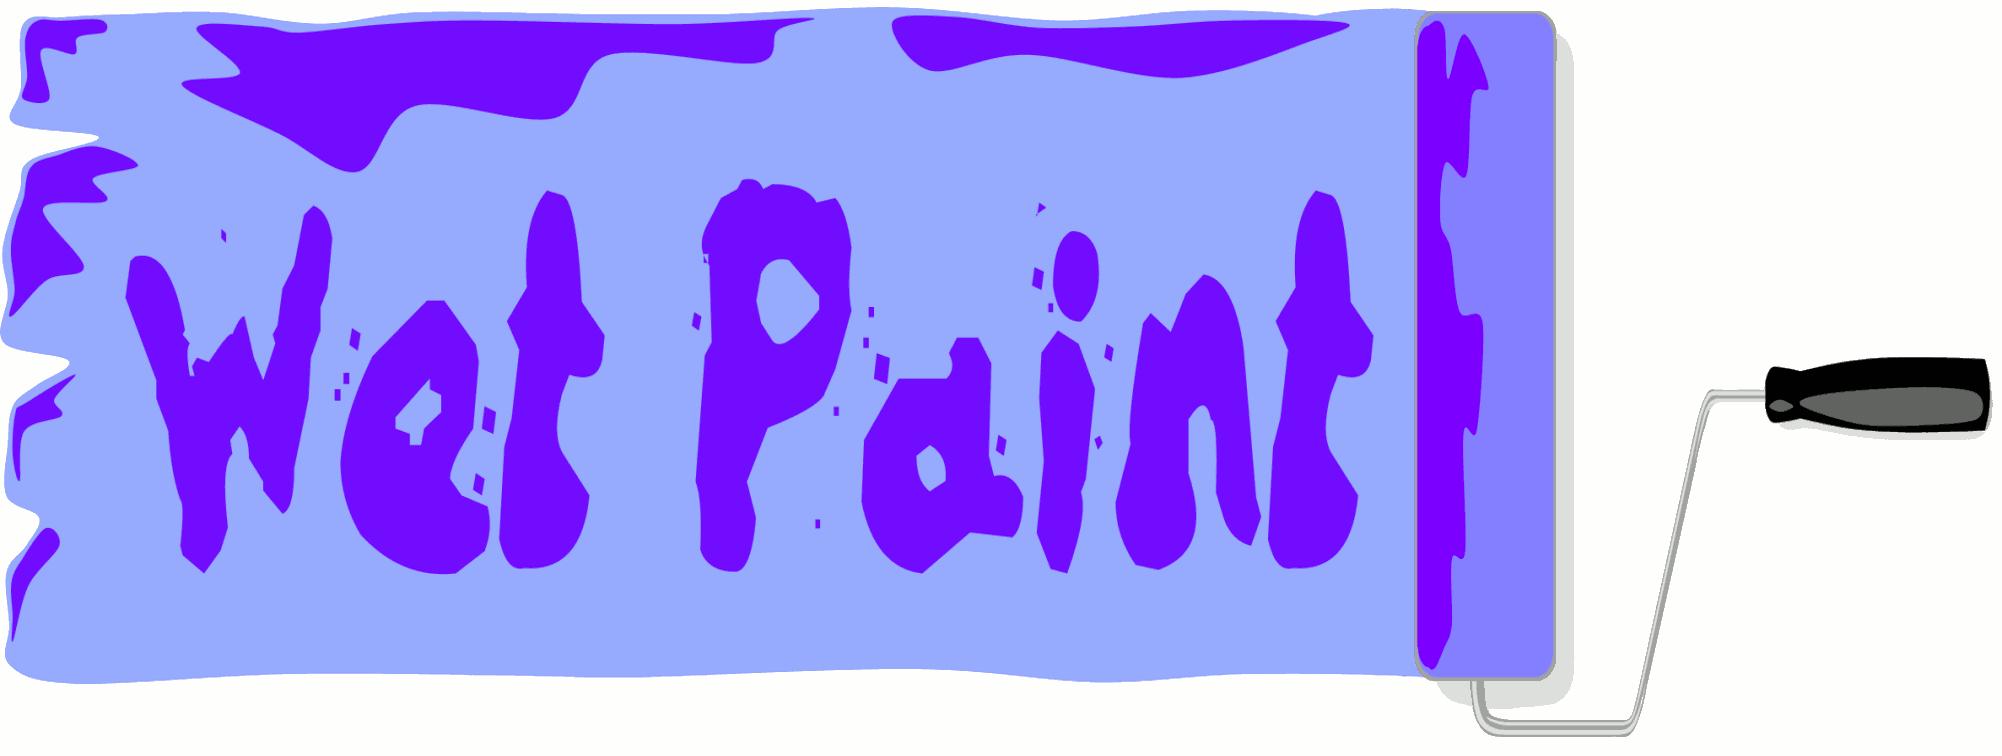 Paint clipart wet paint Inspiration Clipart Wet and Cliparts